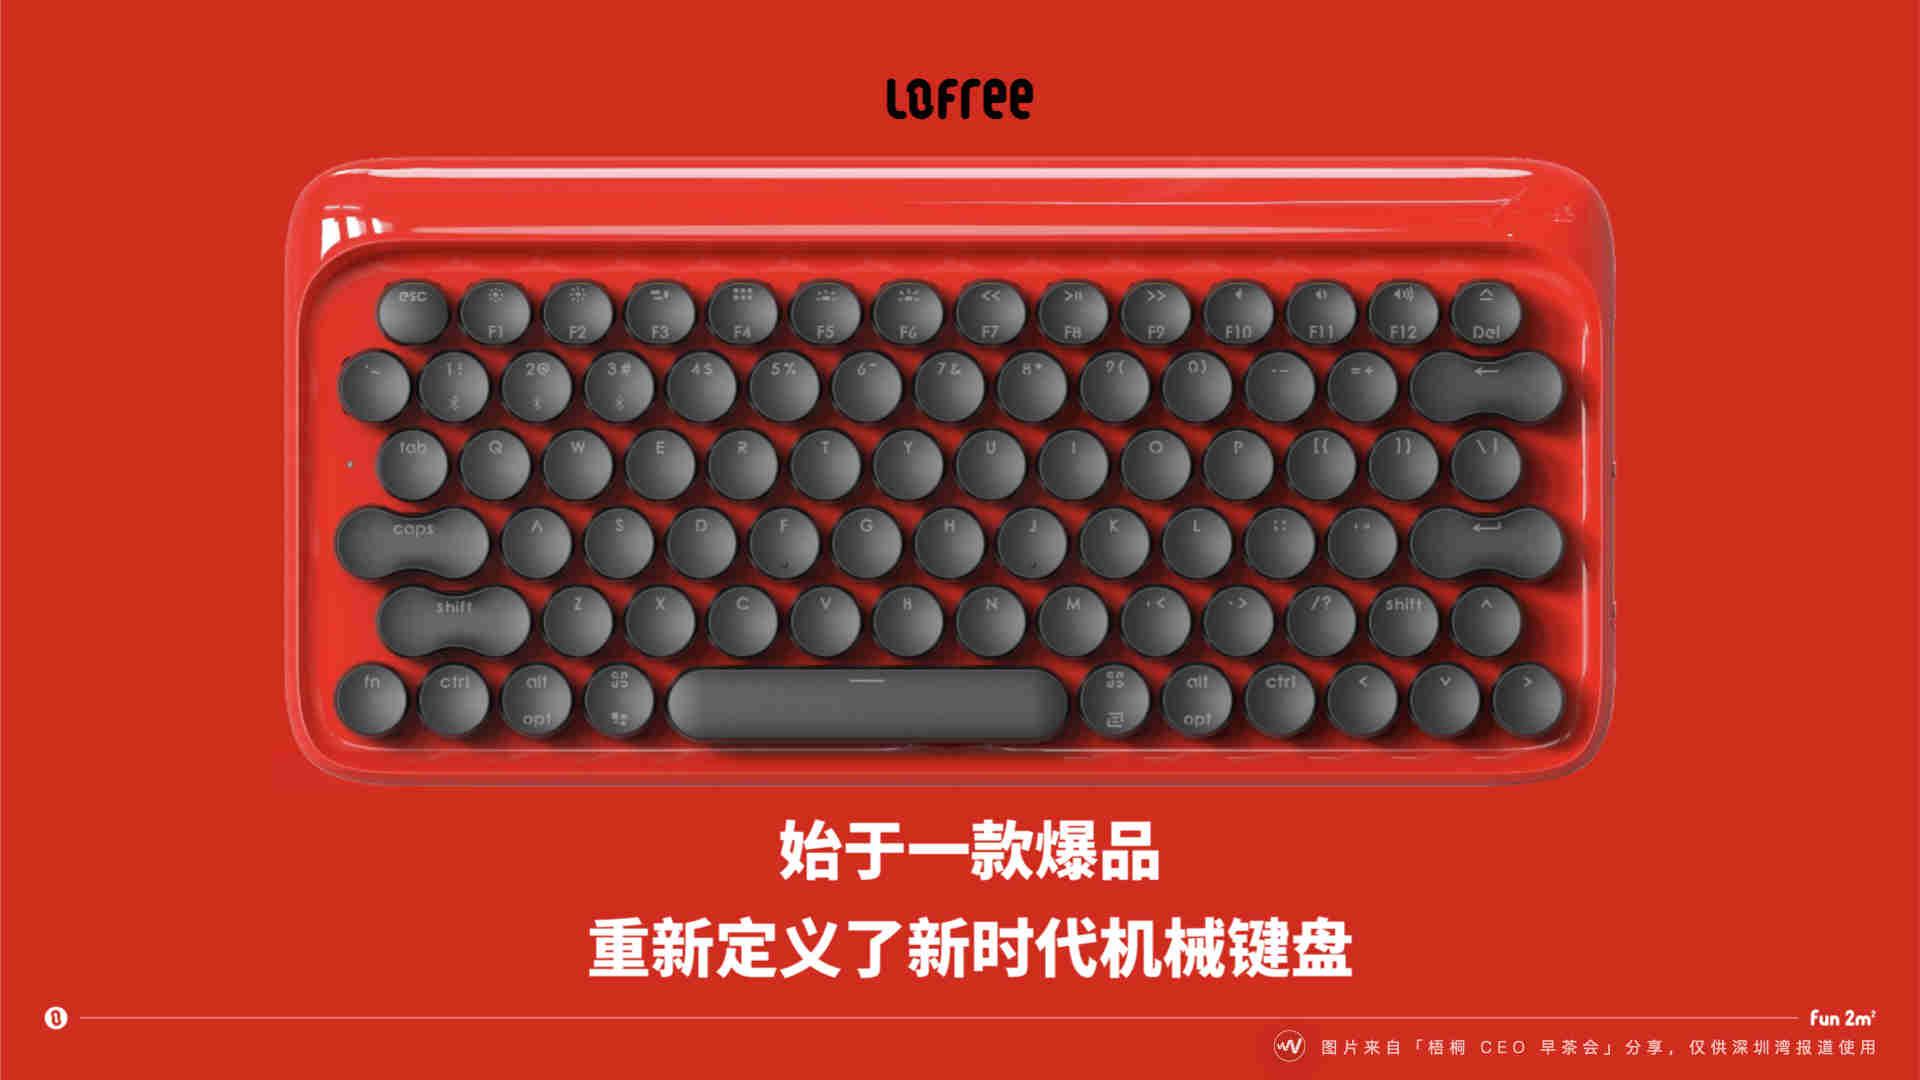 1-Lofree 洛斐键盘